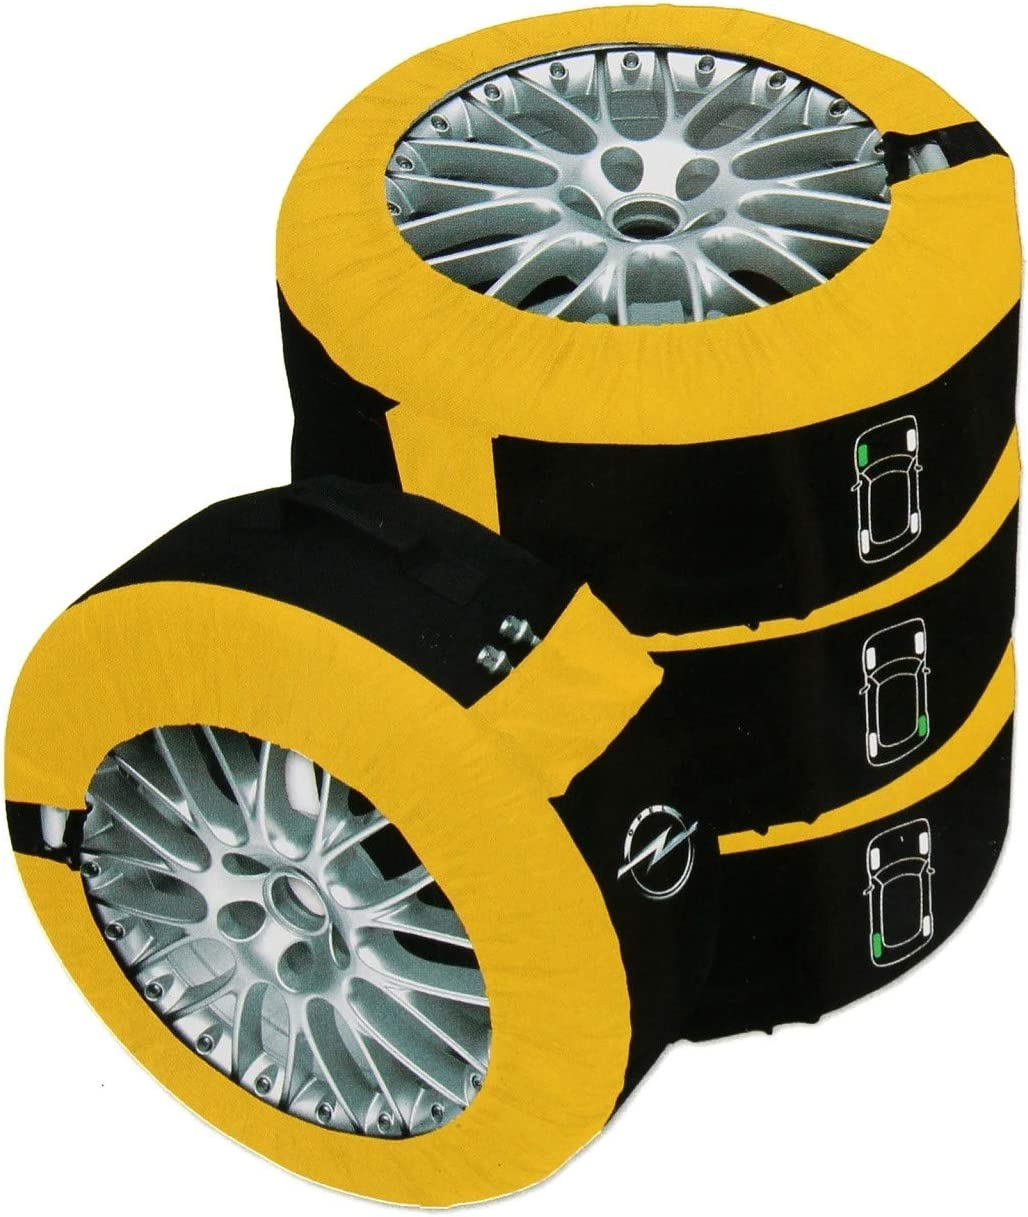 Opel Set 4 Borse custodie per gomme Pneumatici Originali Taglia XL per SUV e Ruote da 19 a 20 95599243